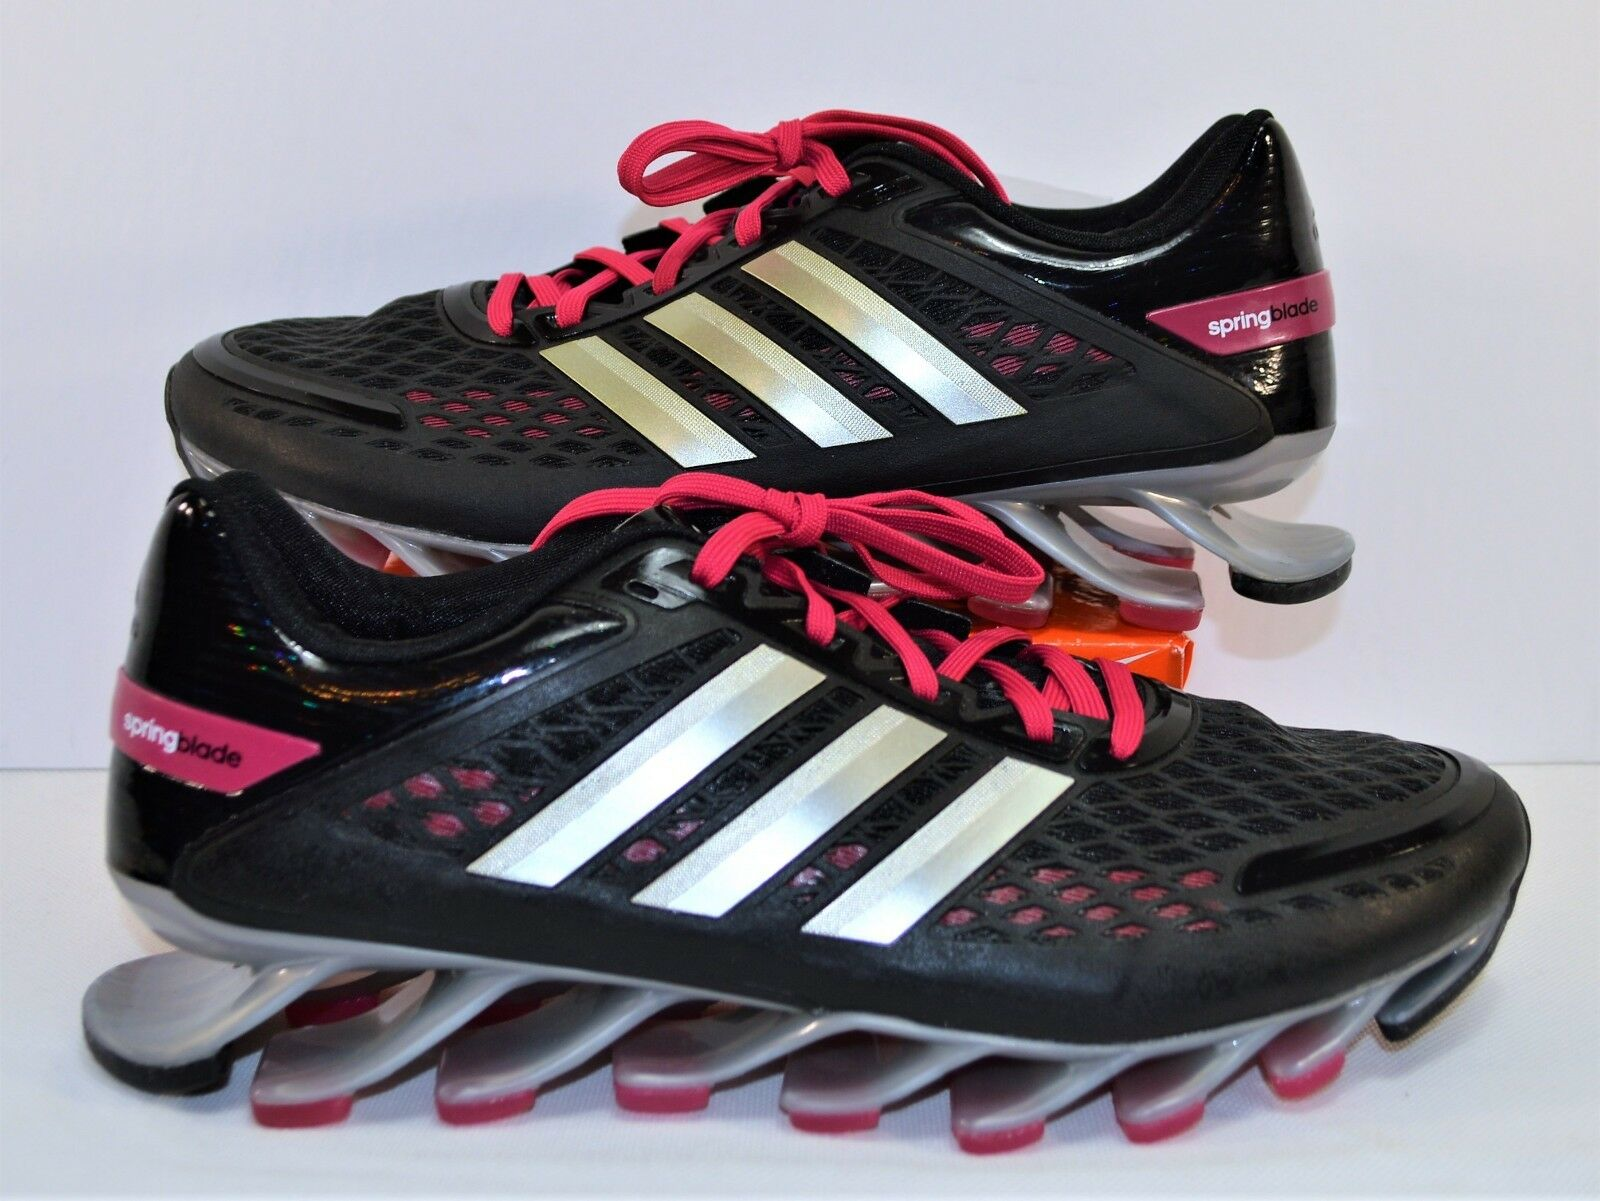 Adidas Springblade Razor Black & Pink Womens Running shoes Sz 10 NEW G97687 RARE